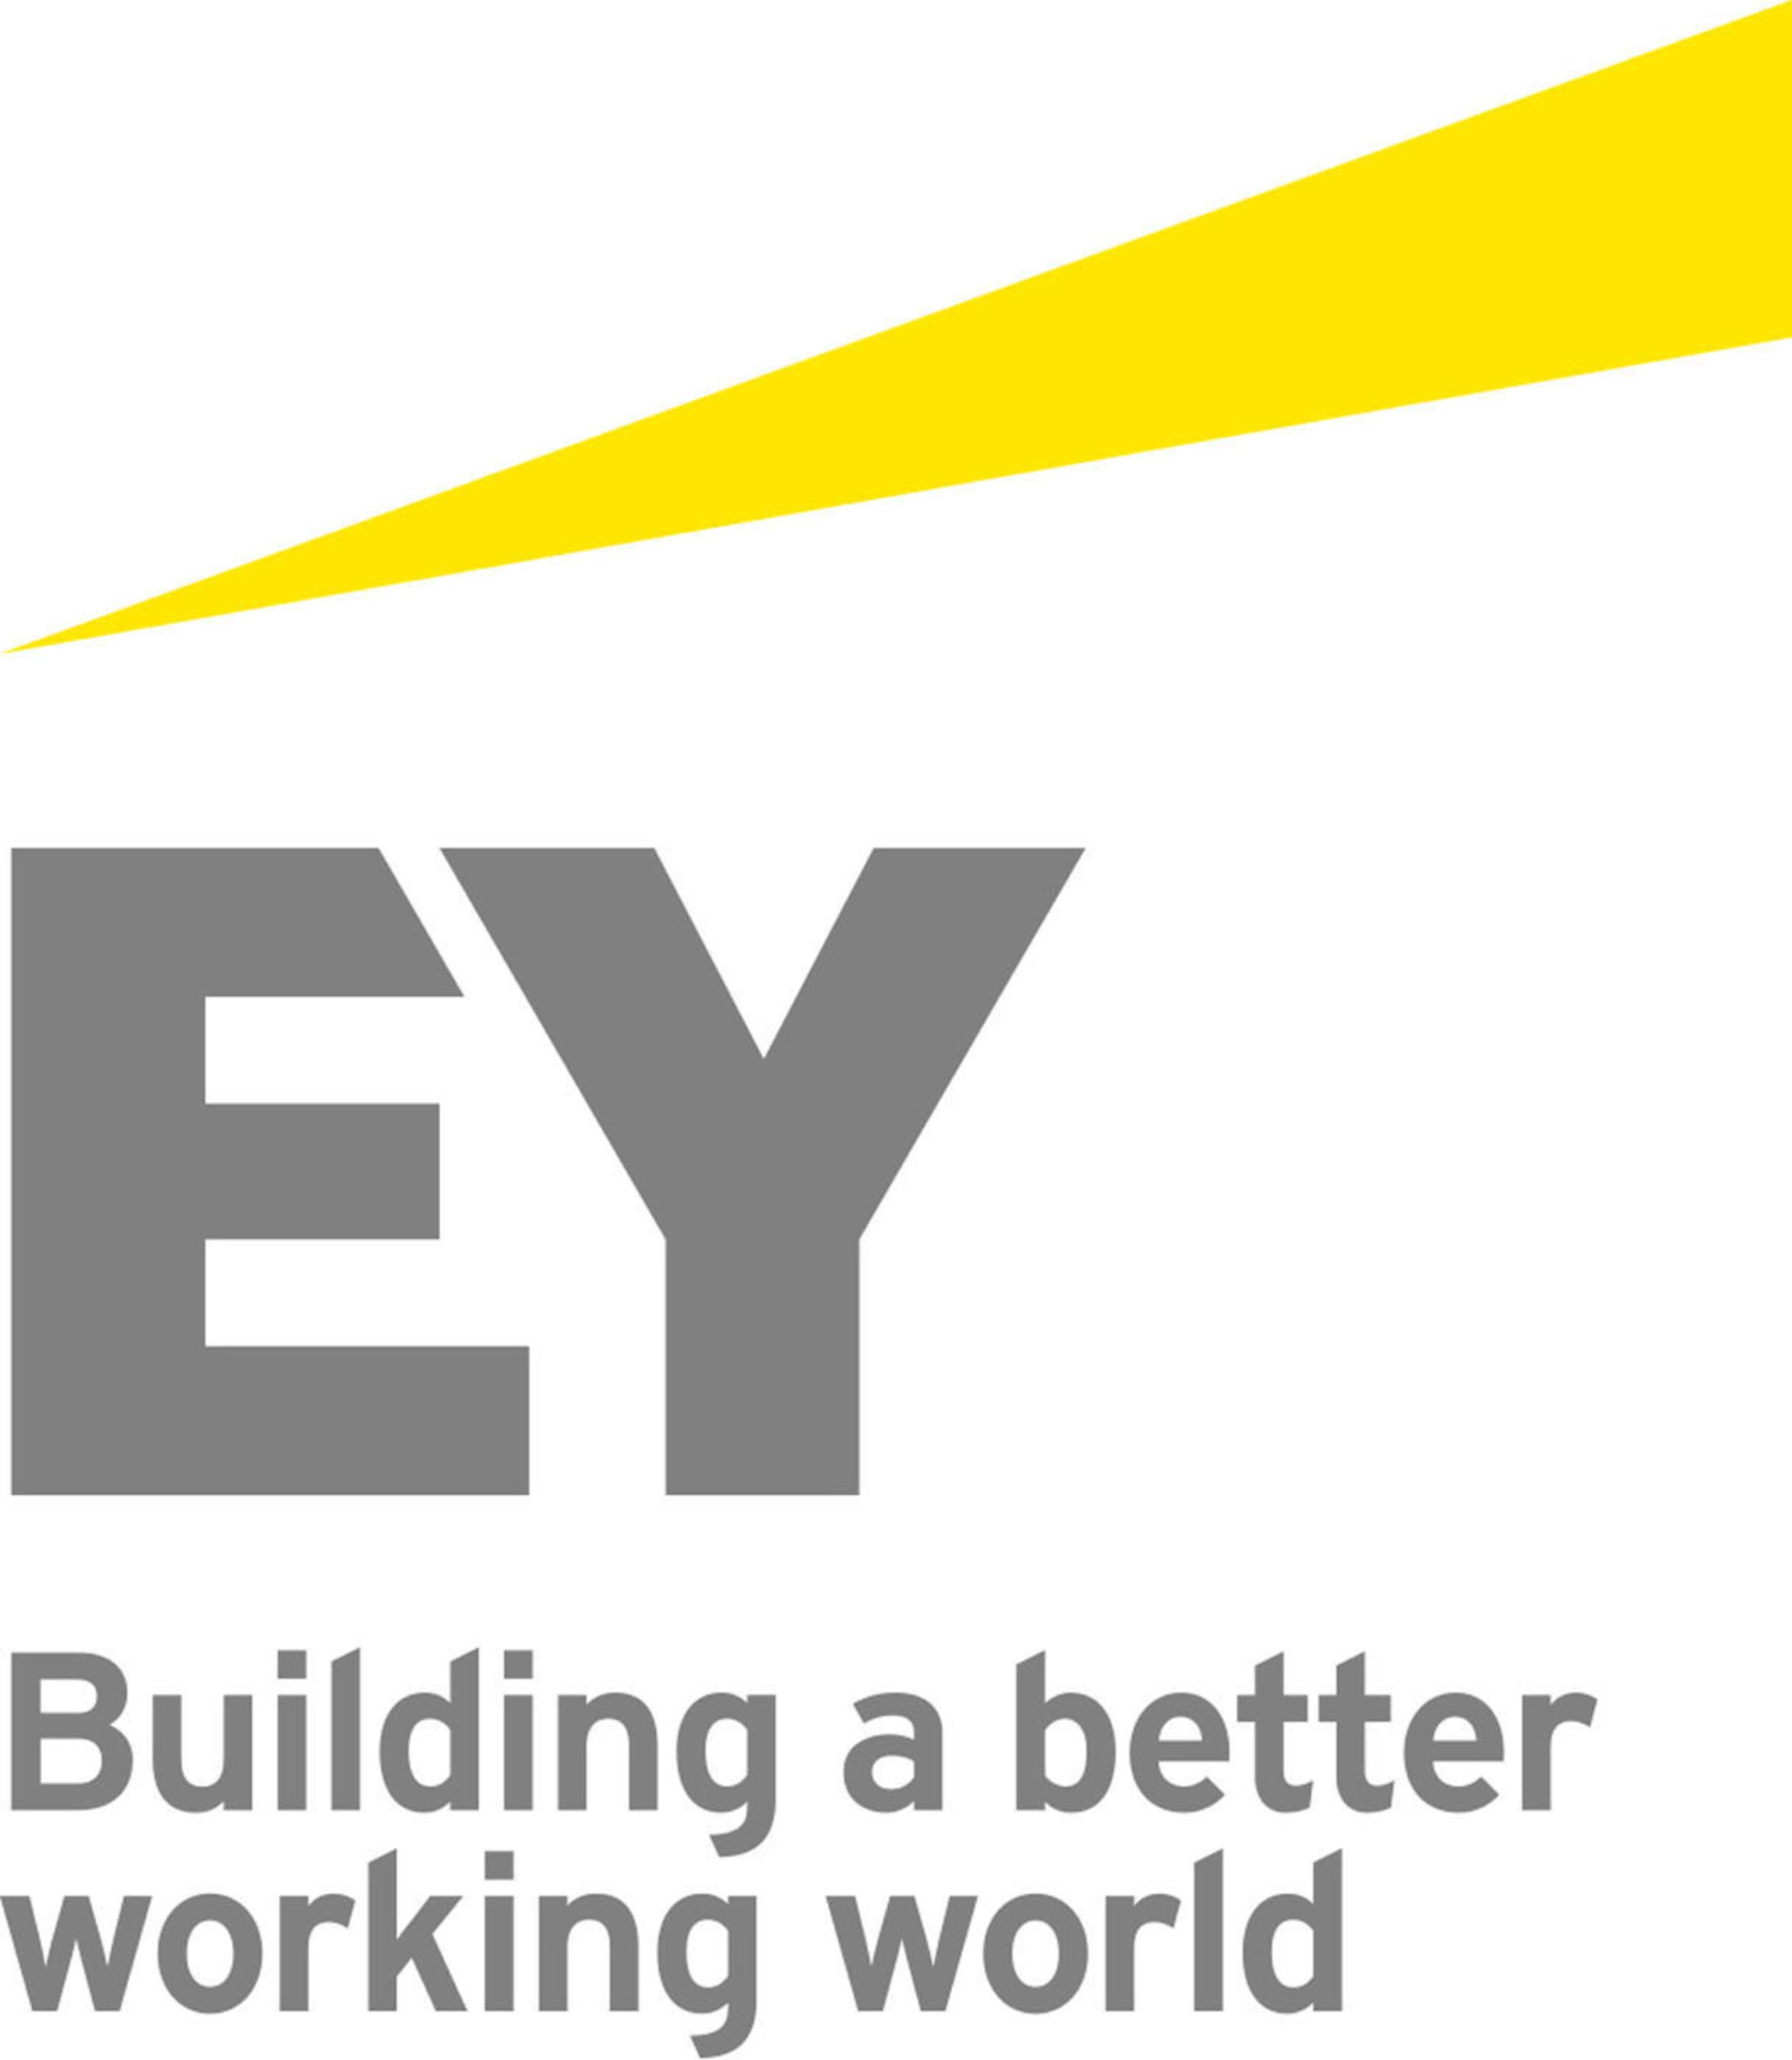 EY Building a better working world logo